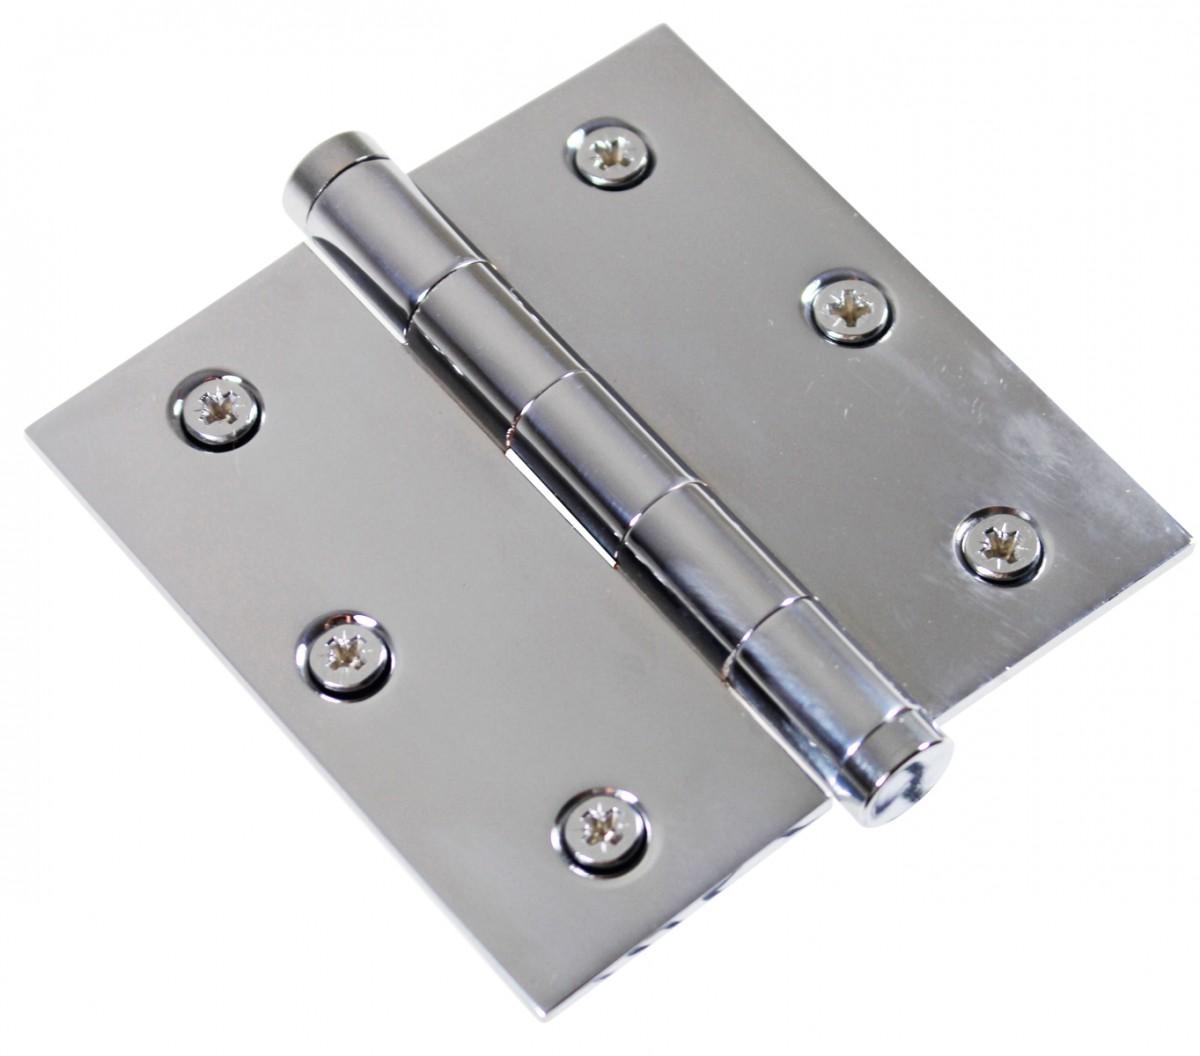 Chrome Solid Brass Cabinet Hinge Coin Tip 3 12 Door Hinges Door Hinge Solid Brass Hinge